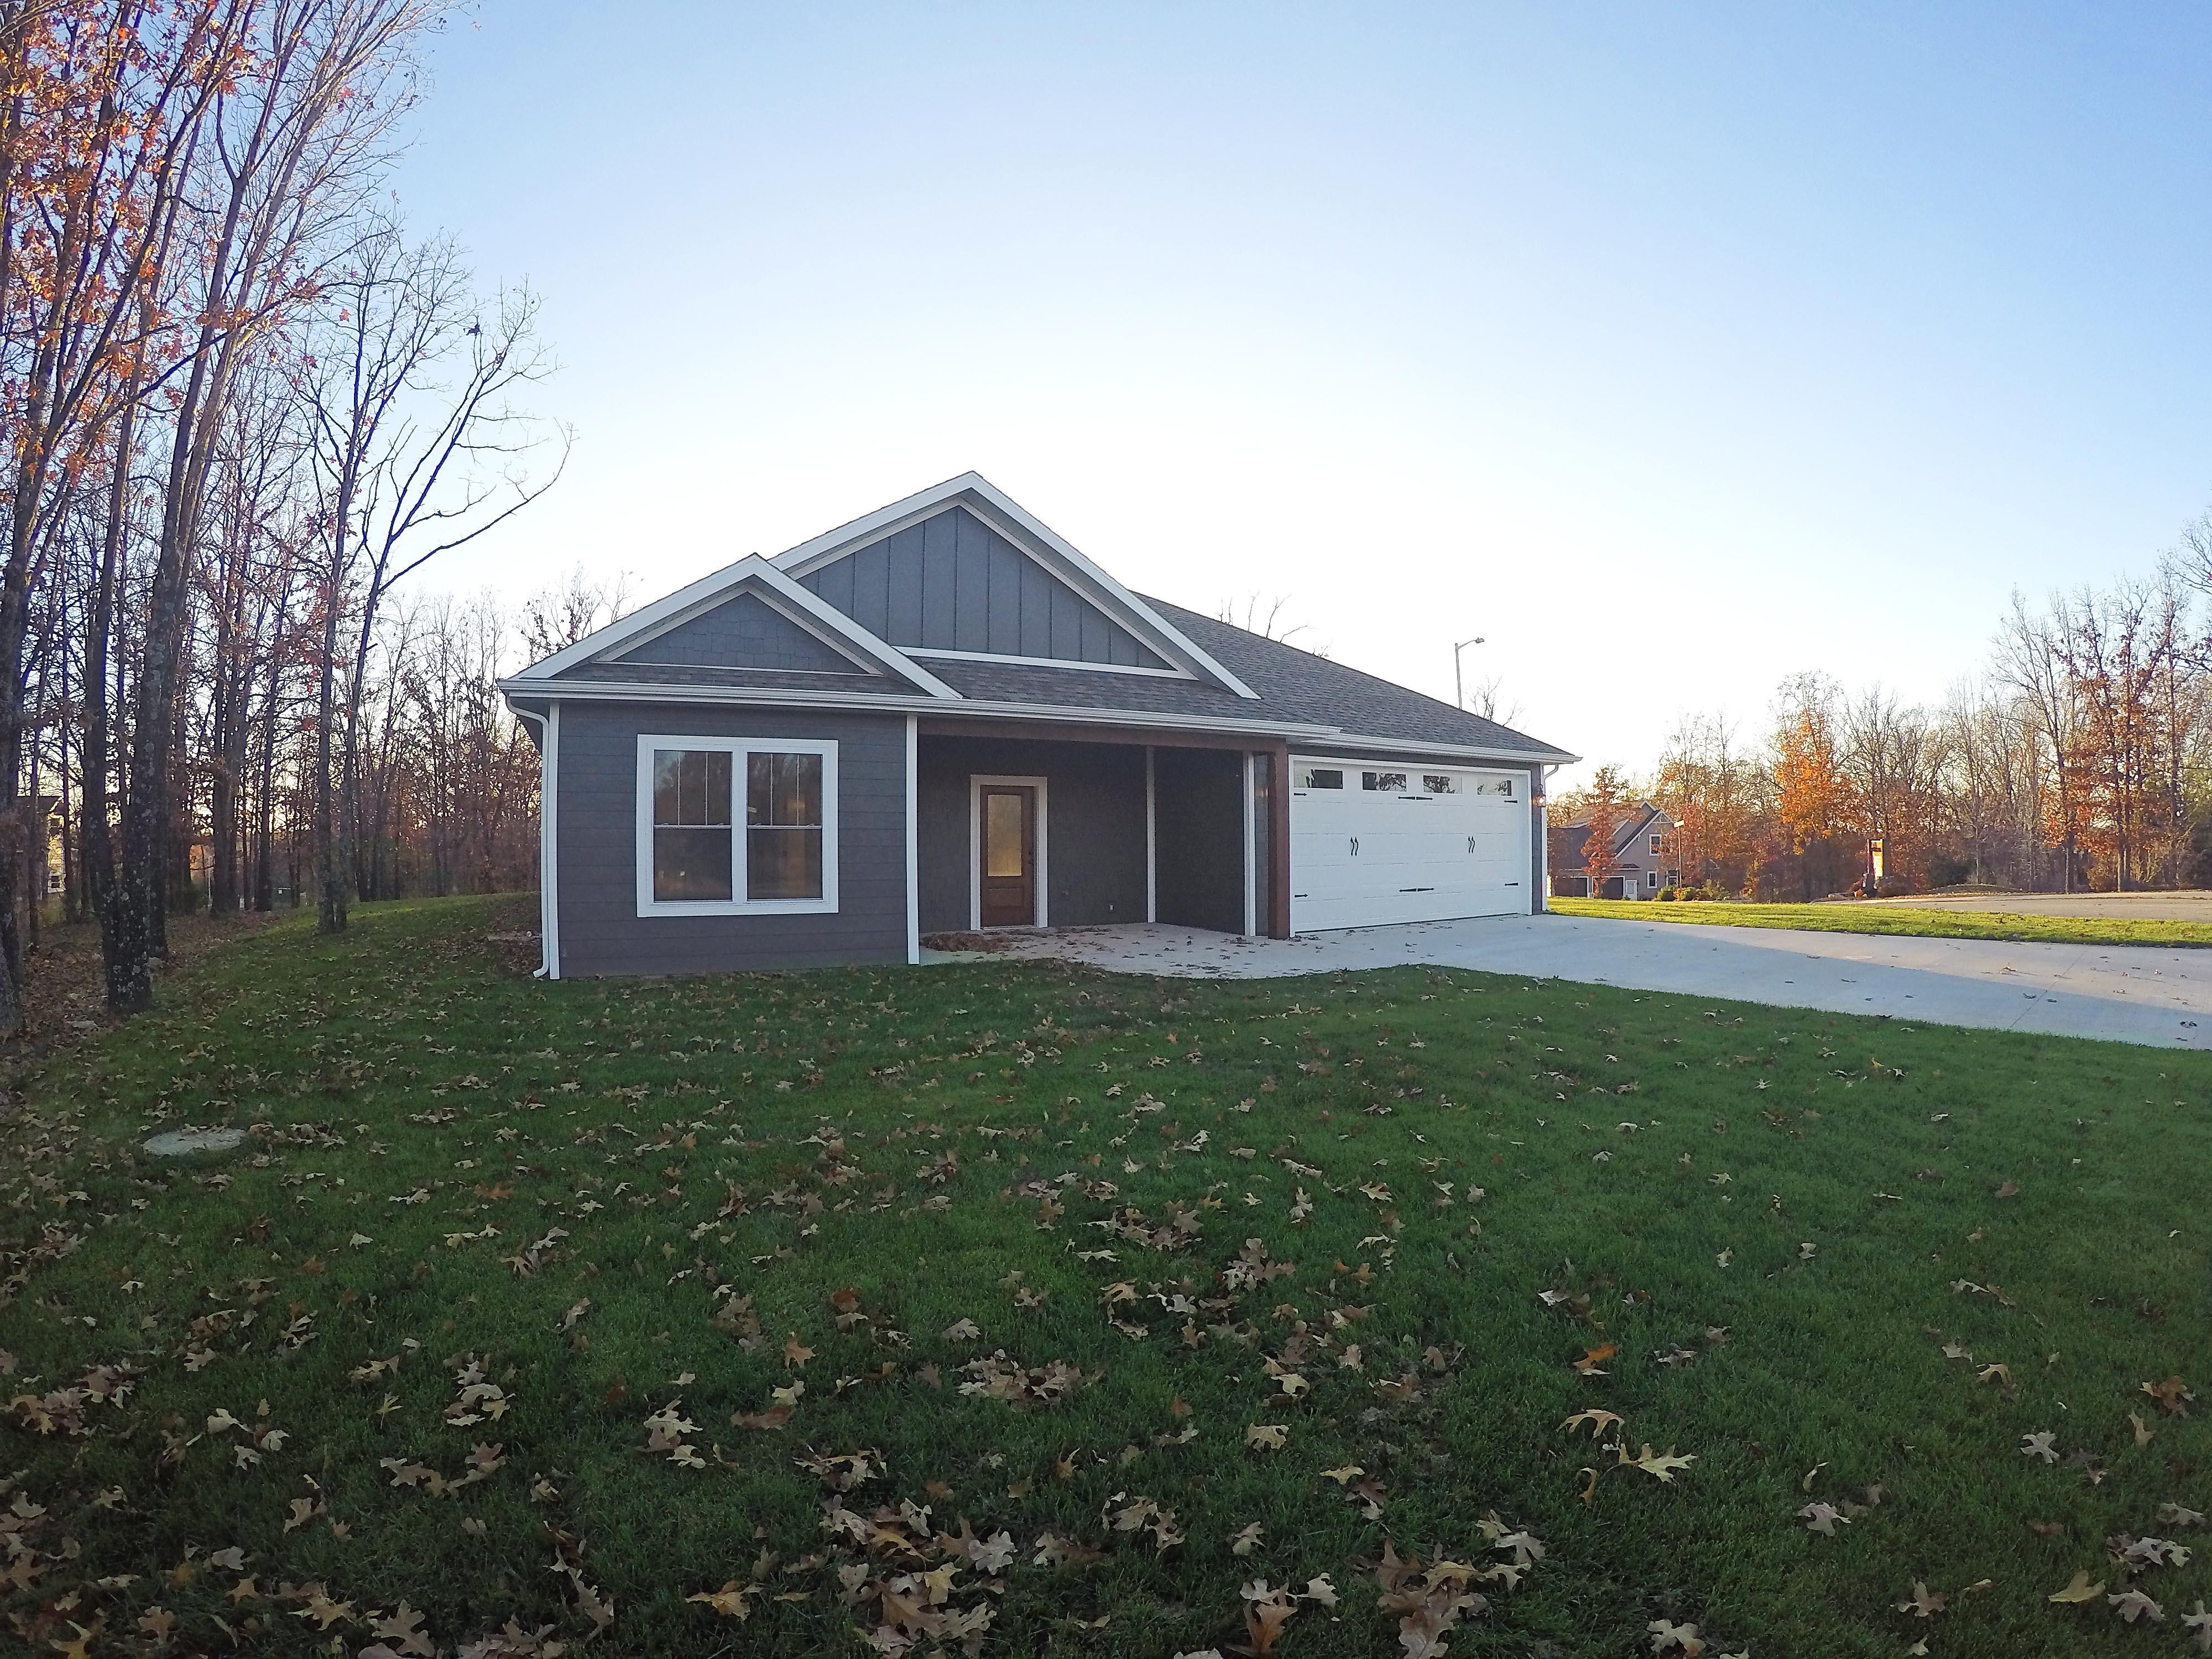 30 Porch Swing Blvd, Camdenton, Missouri 65020